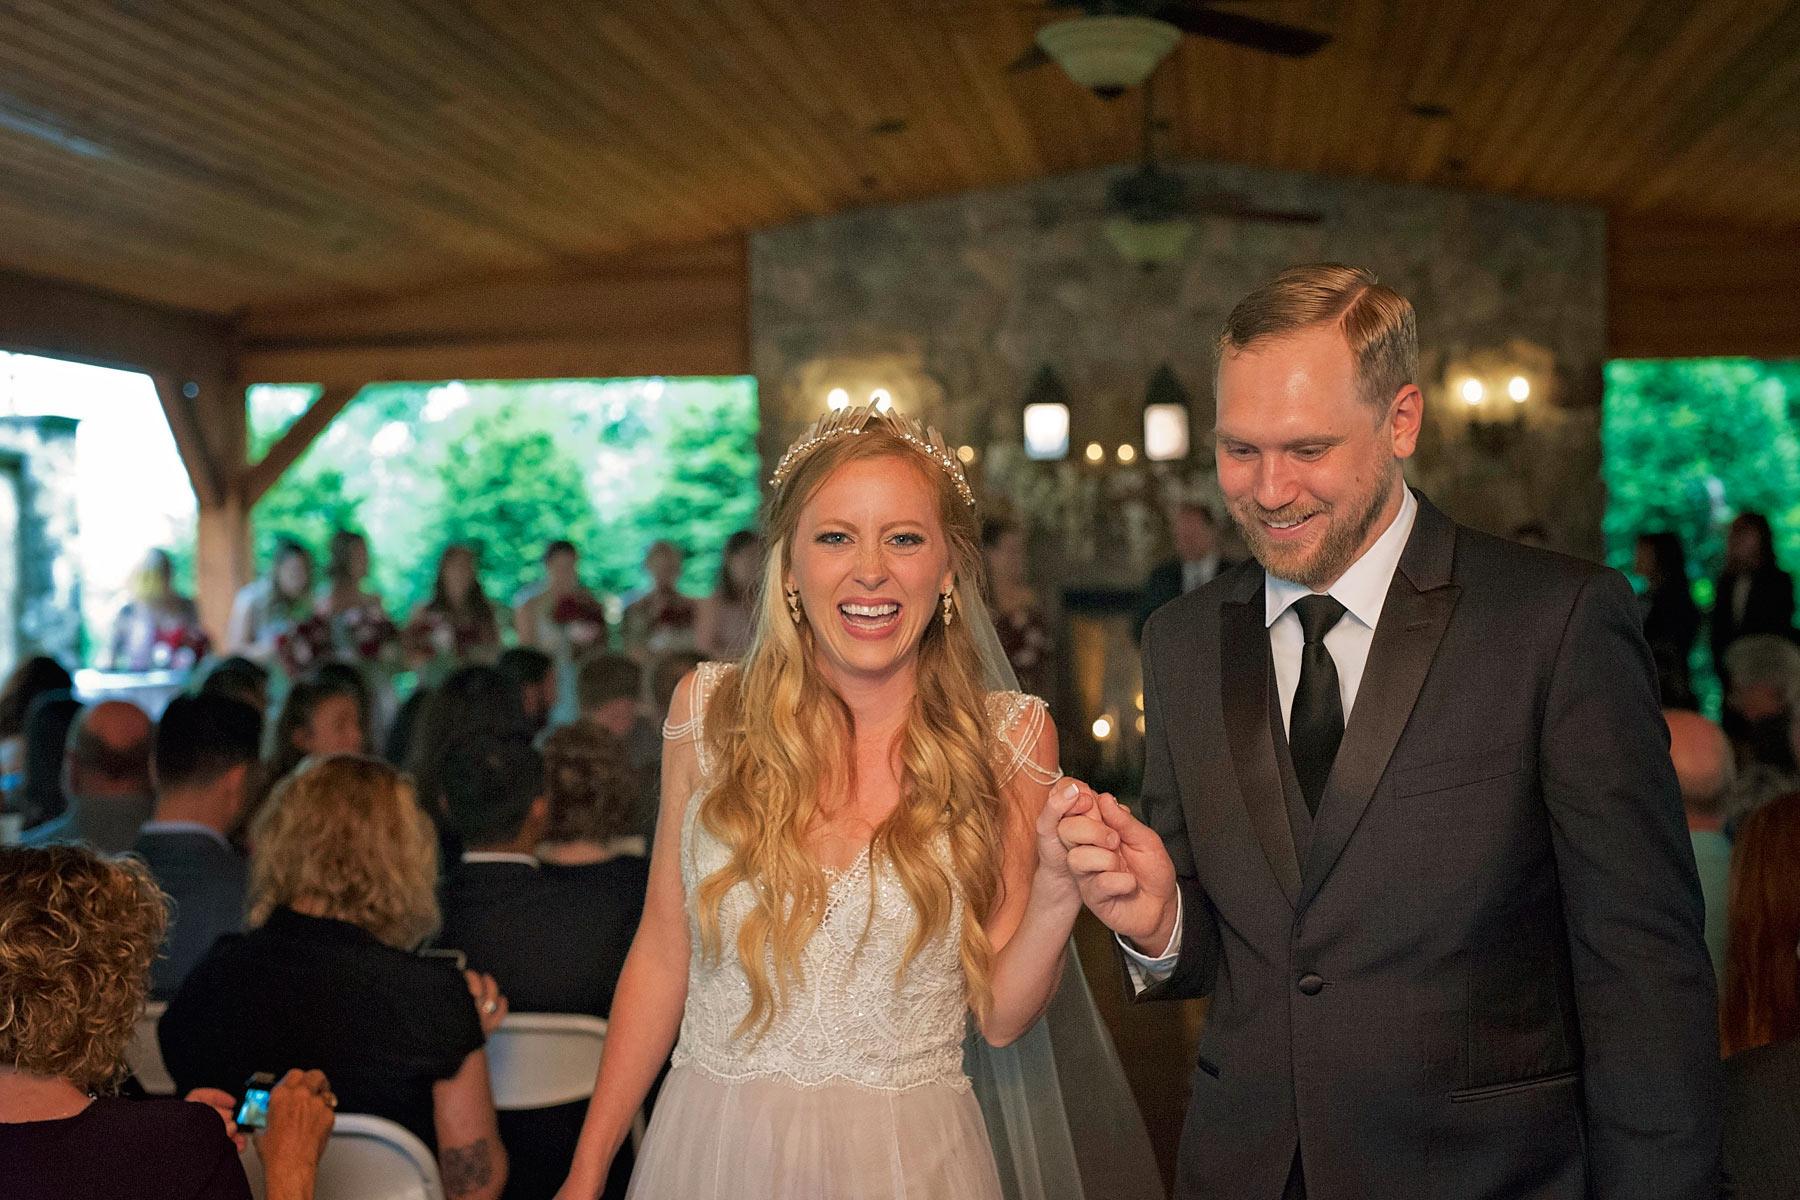 Bucks_County_wedding_photographer_Stroudsmoor_country_inn_wedding_Philadelphia_wedding_photographer_19_bride_and_groom_exit.JPG